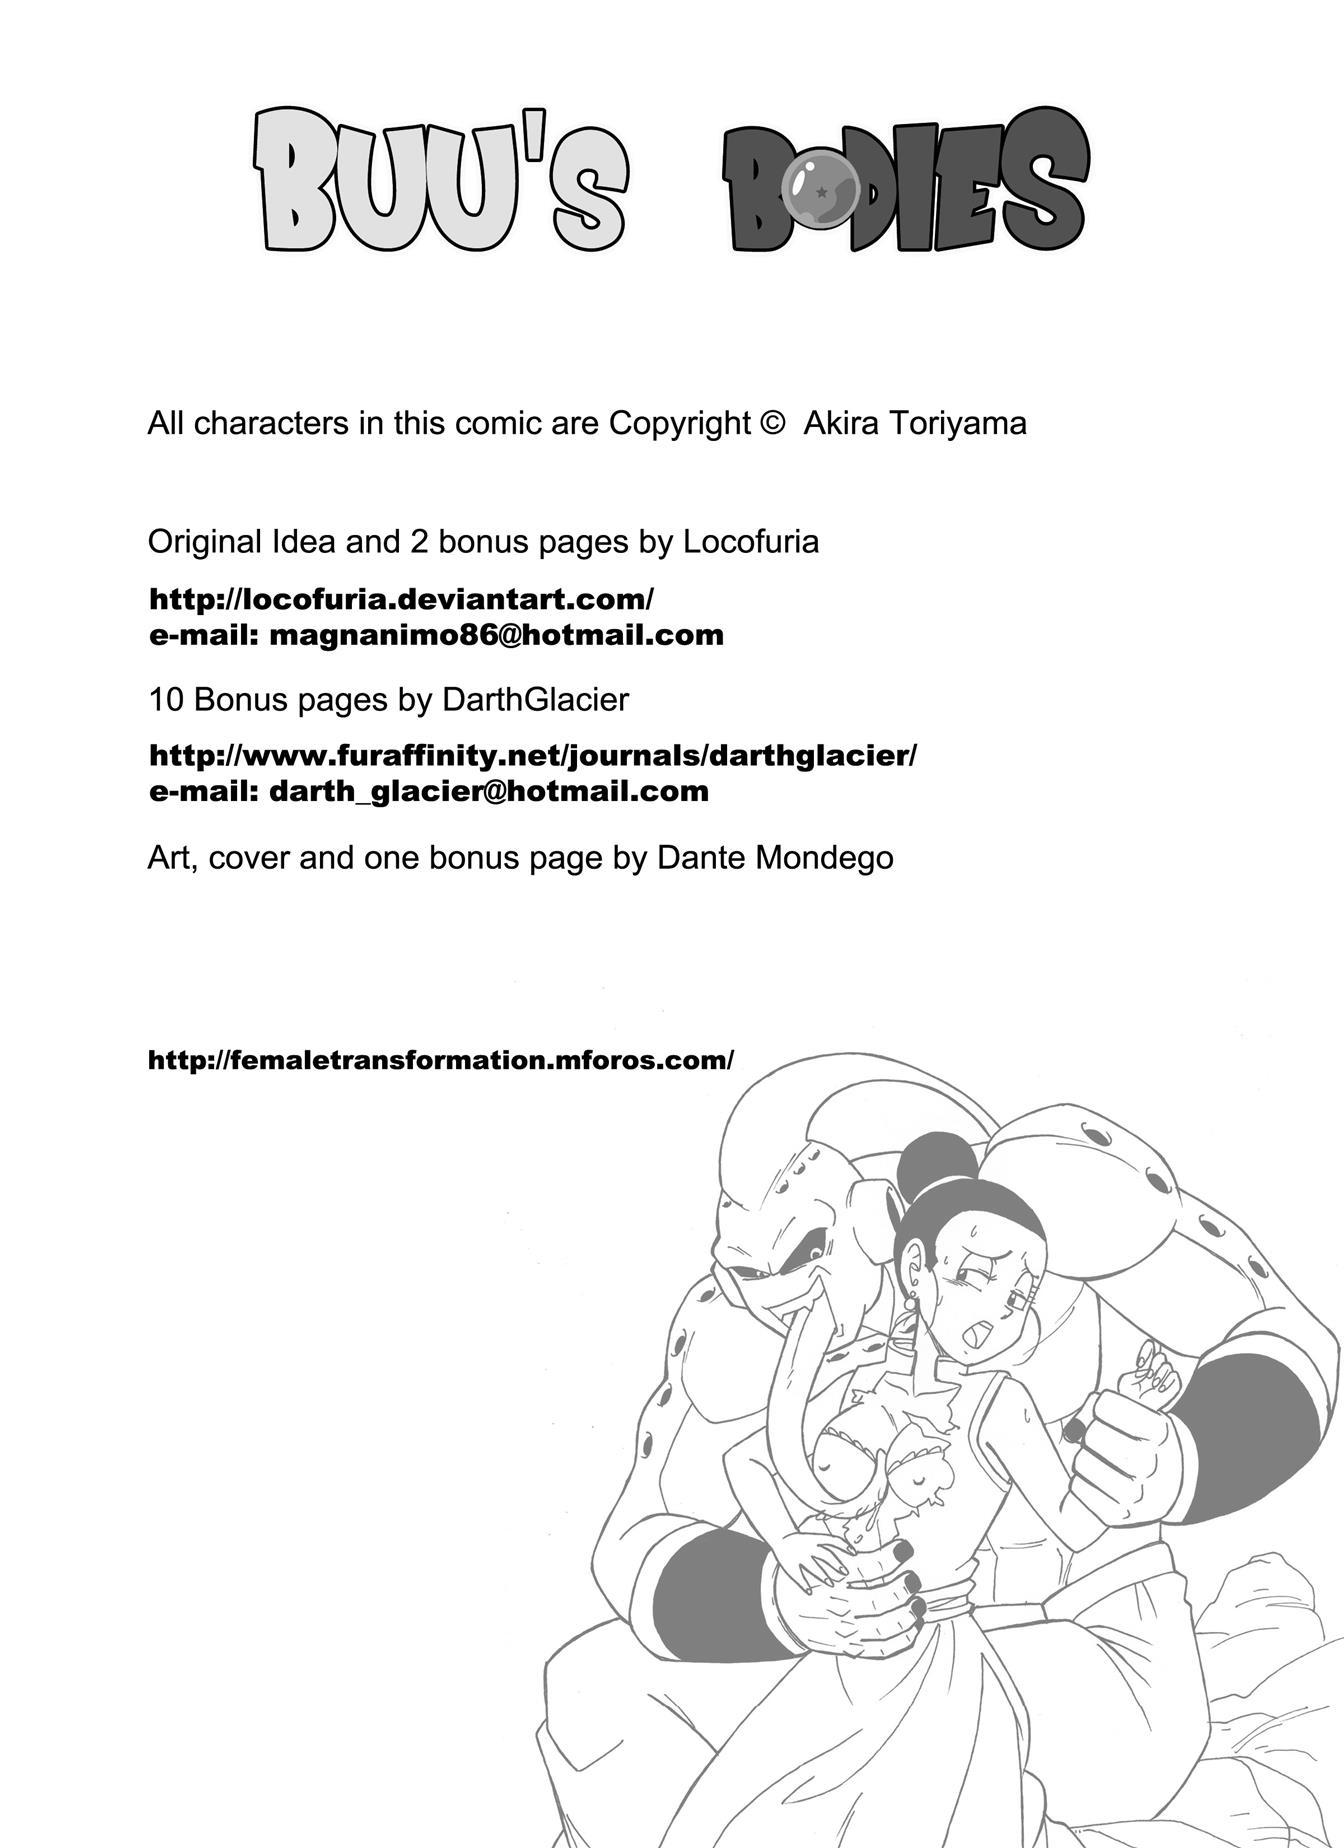 Buu's Bodies 1 (Dragon Ball Z) - Foto 2